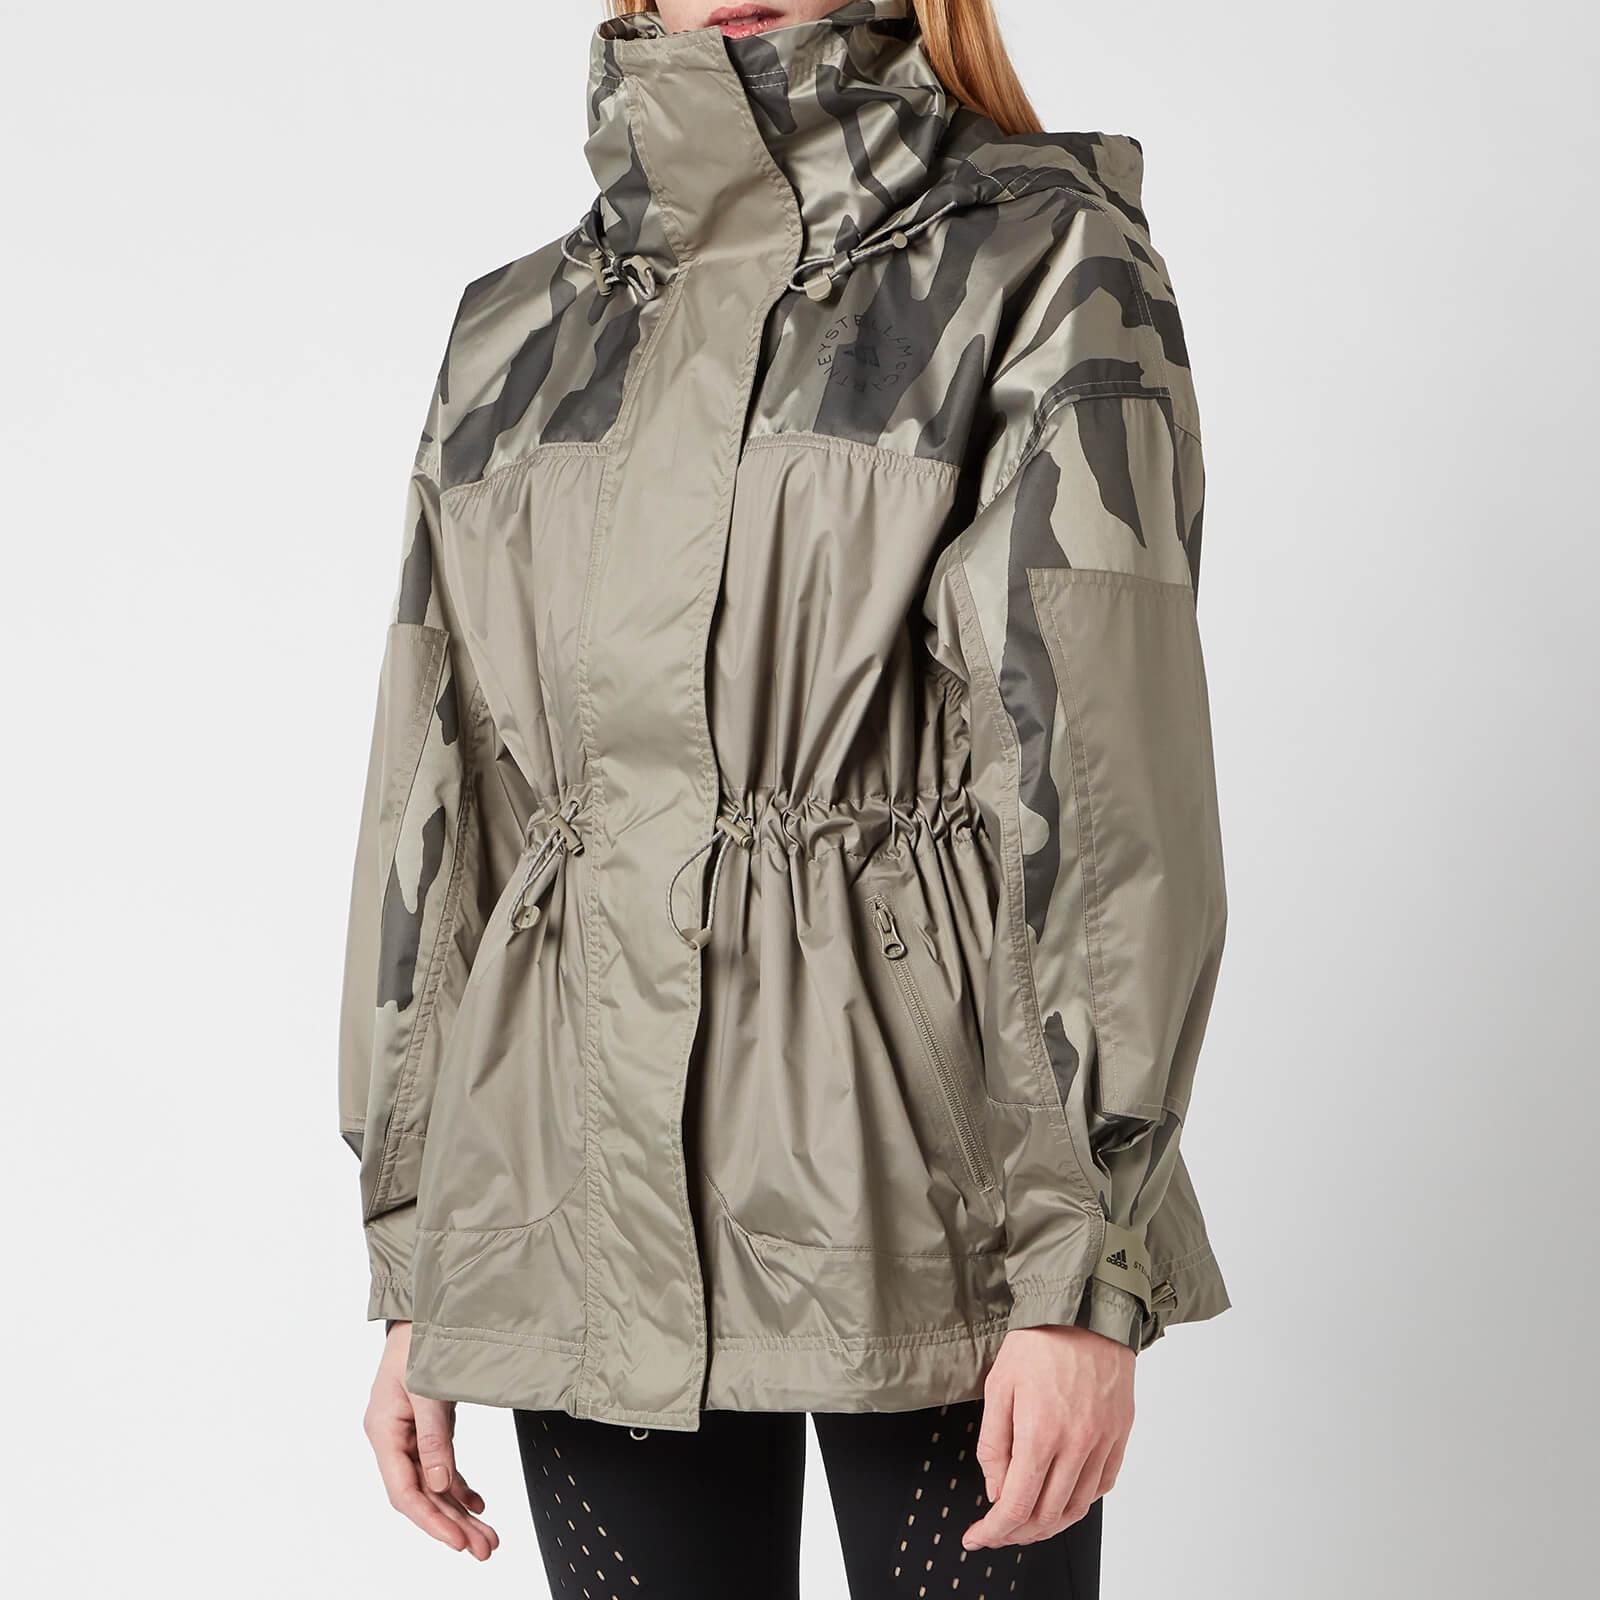 Adidas By Stella Mccartney Women's Asmc Truepace Warmlevel Jacket - Clay